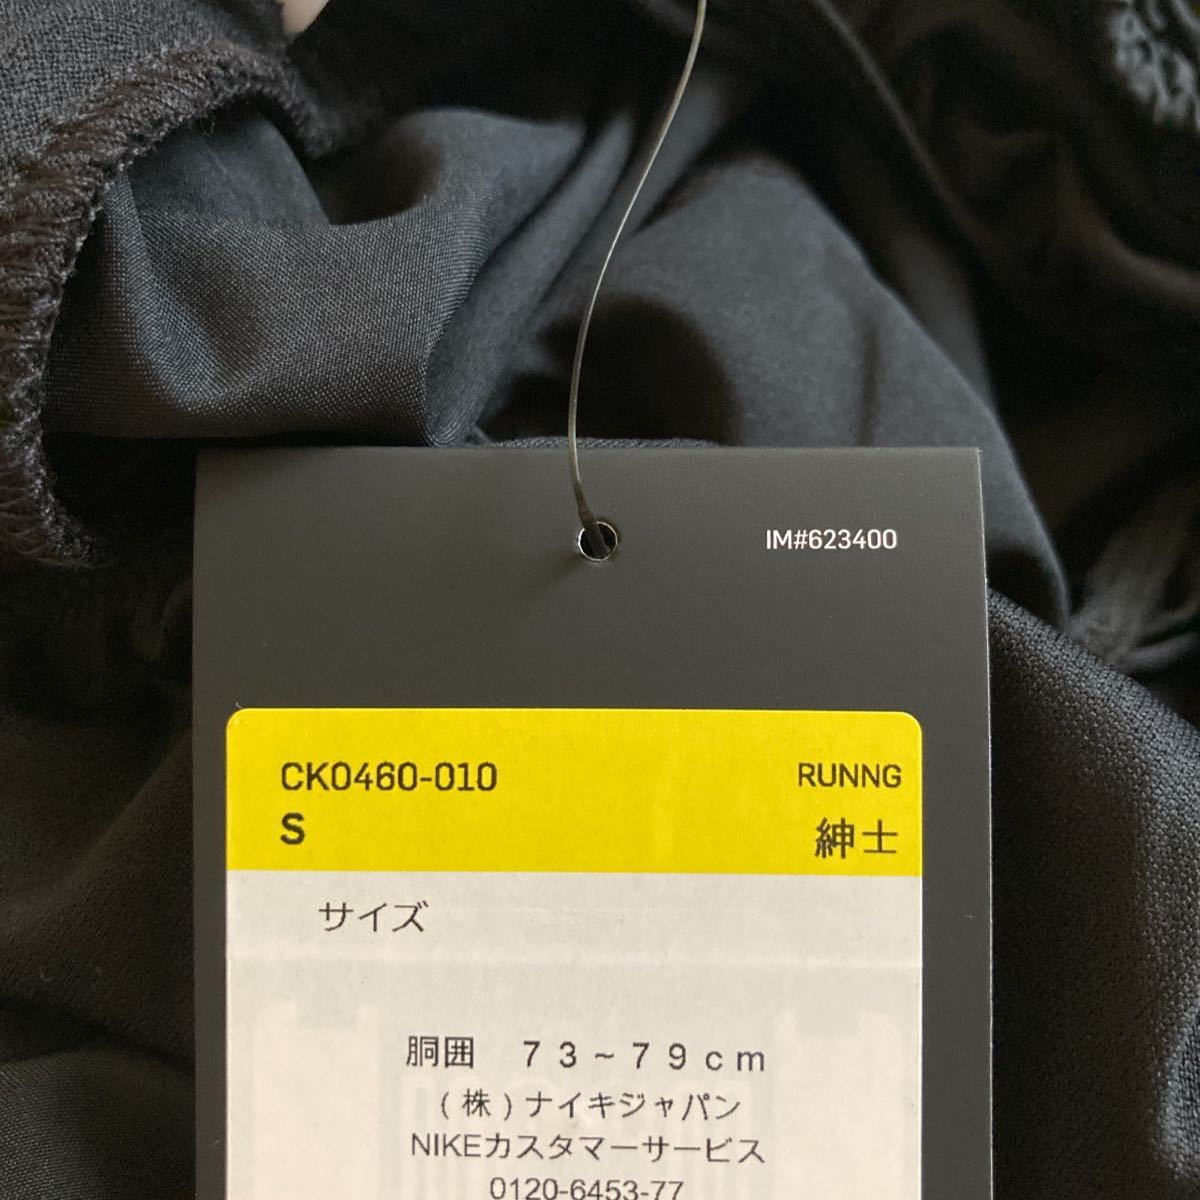 NIKE ショートパンツ ランニング用 インナーパンツ付き メンズS 新品未使用